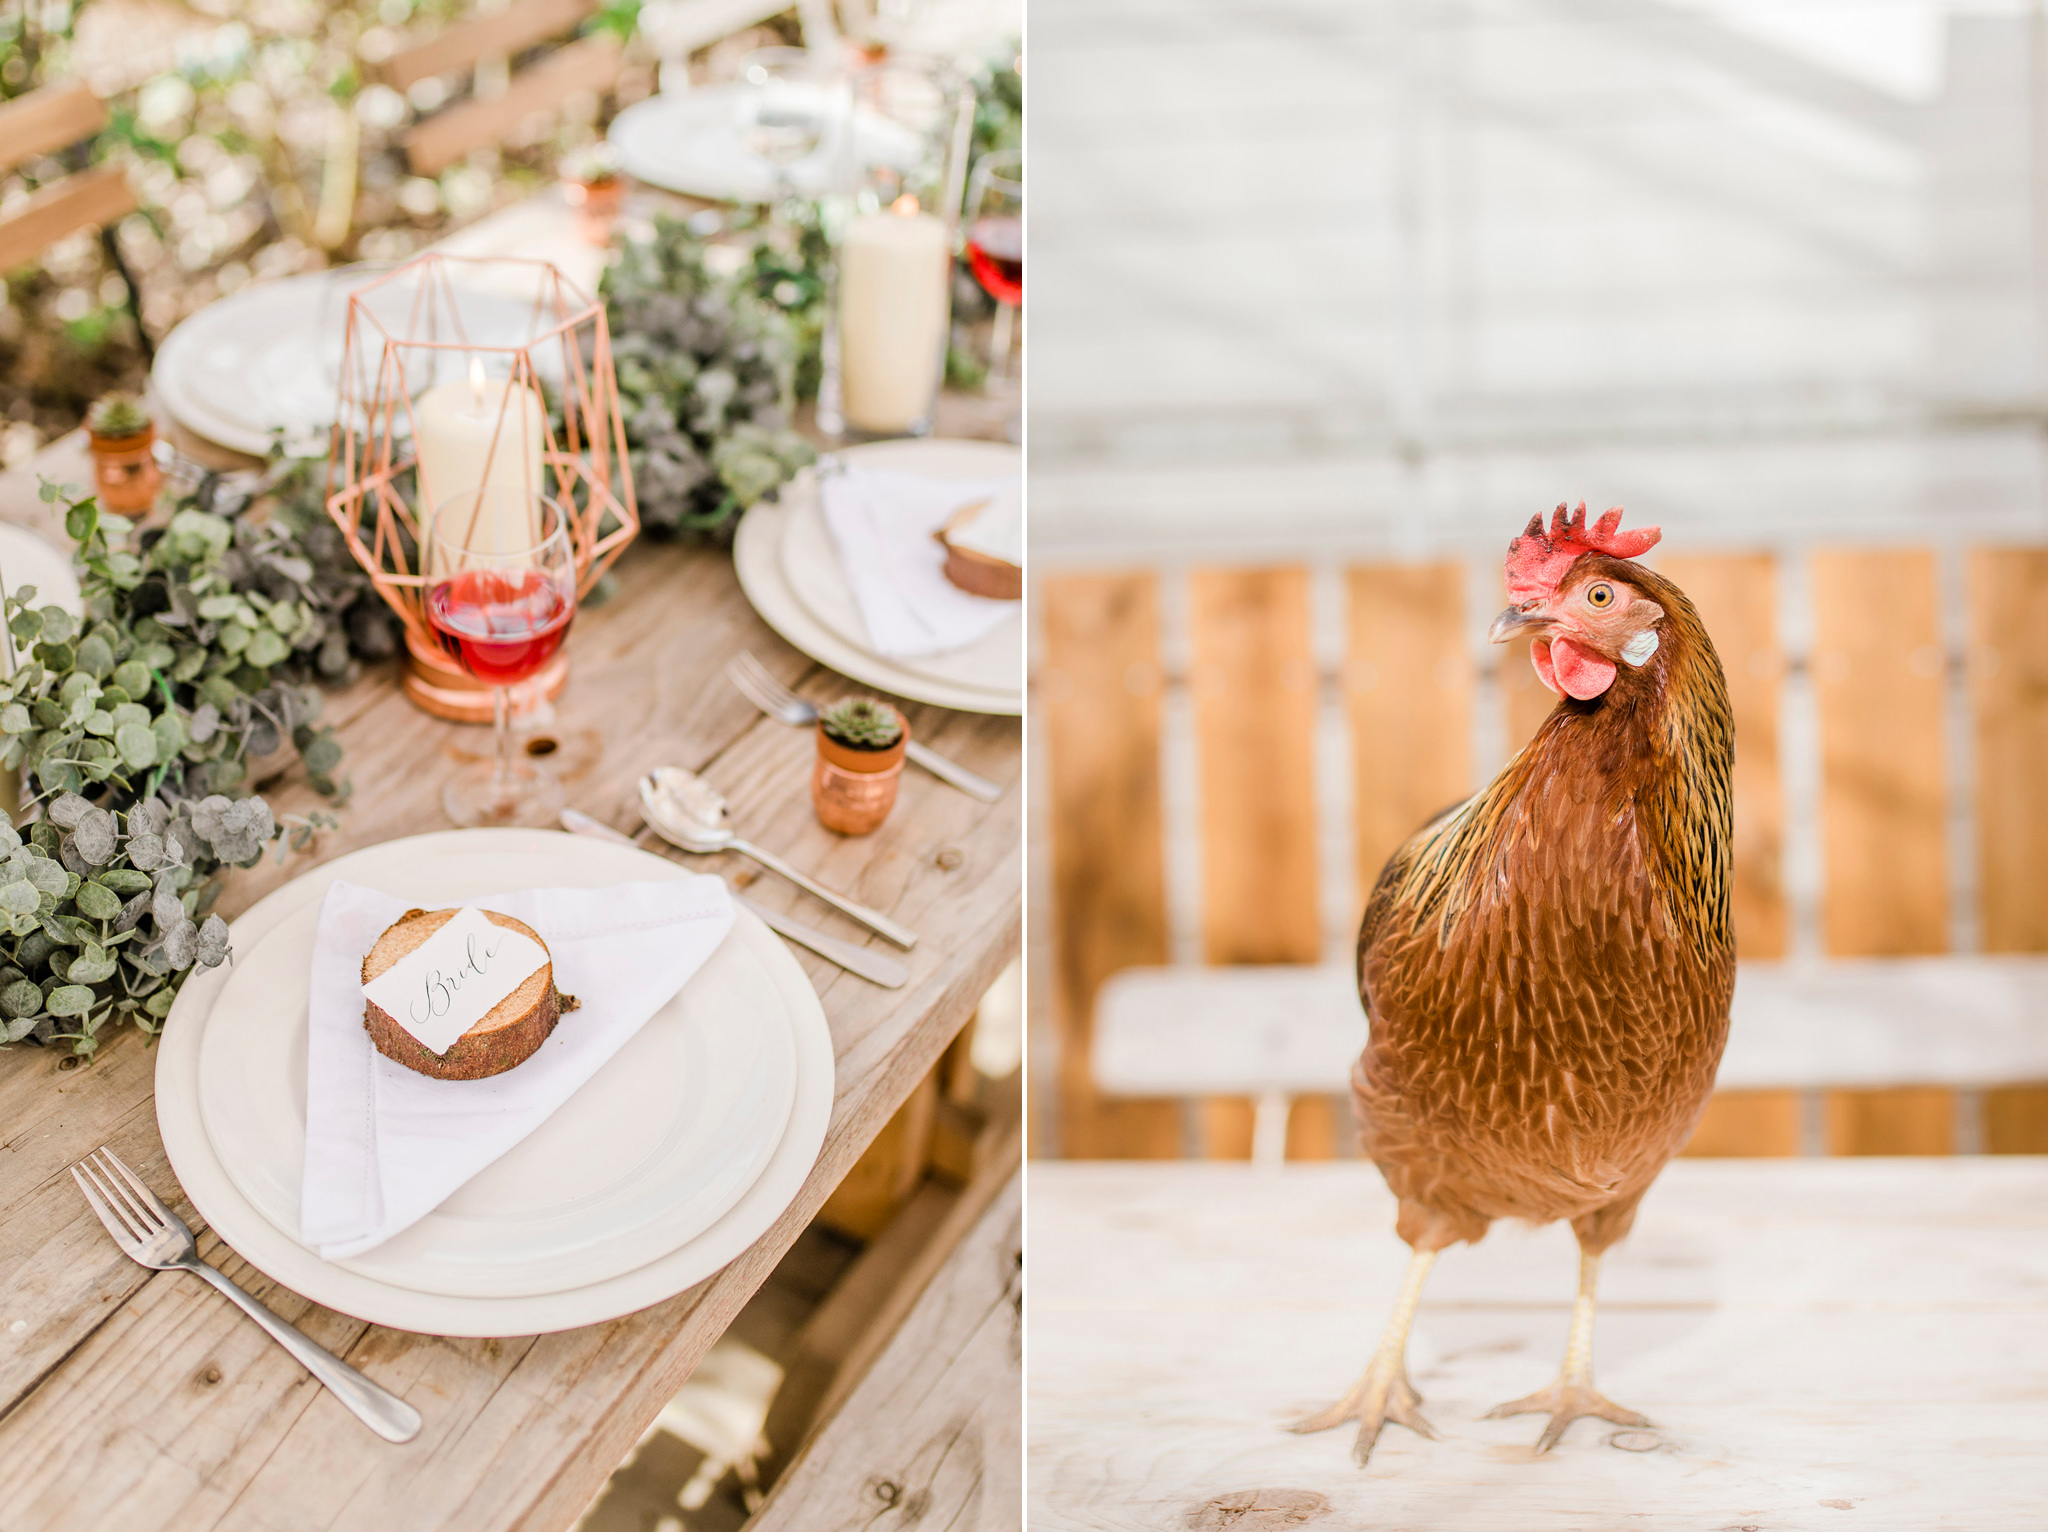 rustic-romantic-outdoor-wedding-photographer-edinburgh-23.jpg